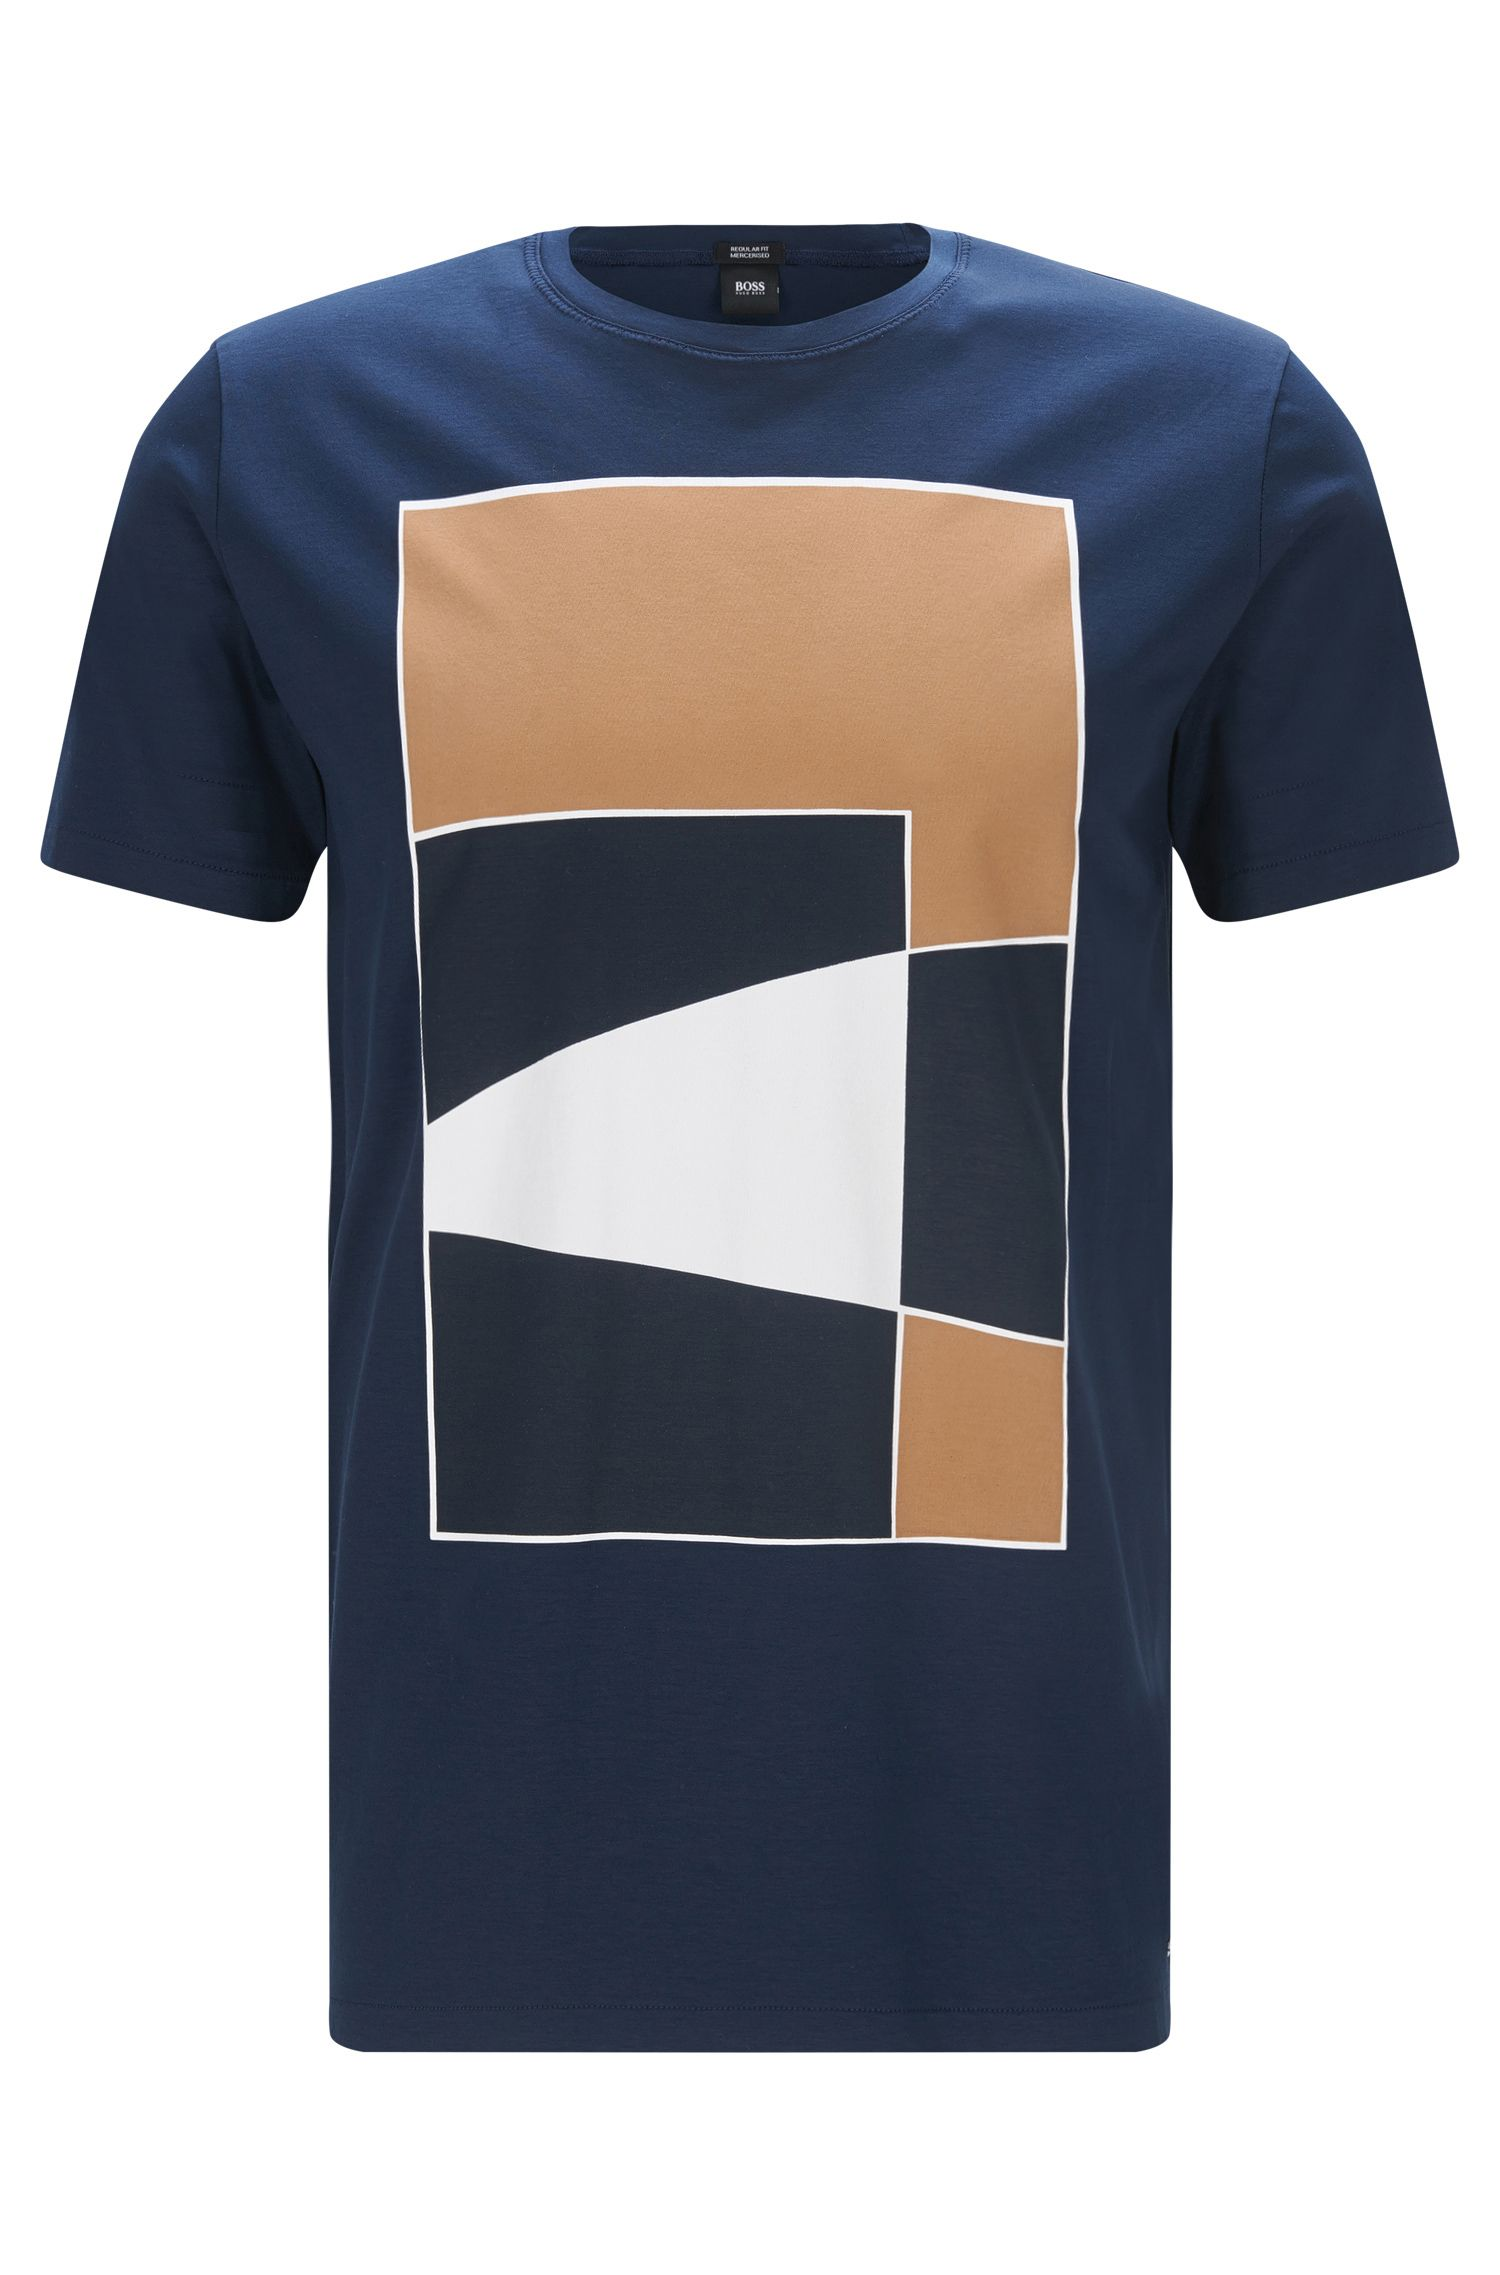 Cotton Graphic T-Shirt   Tilburt